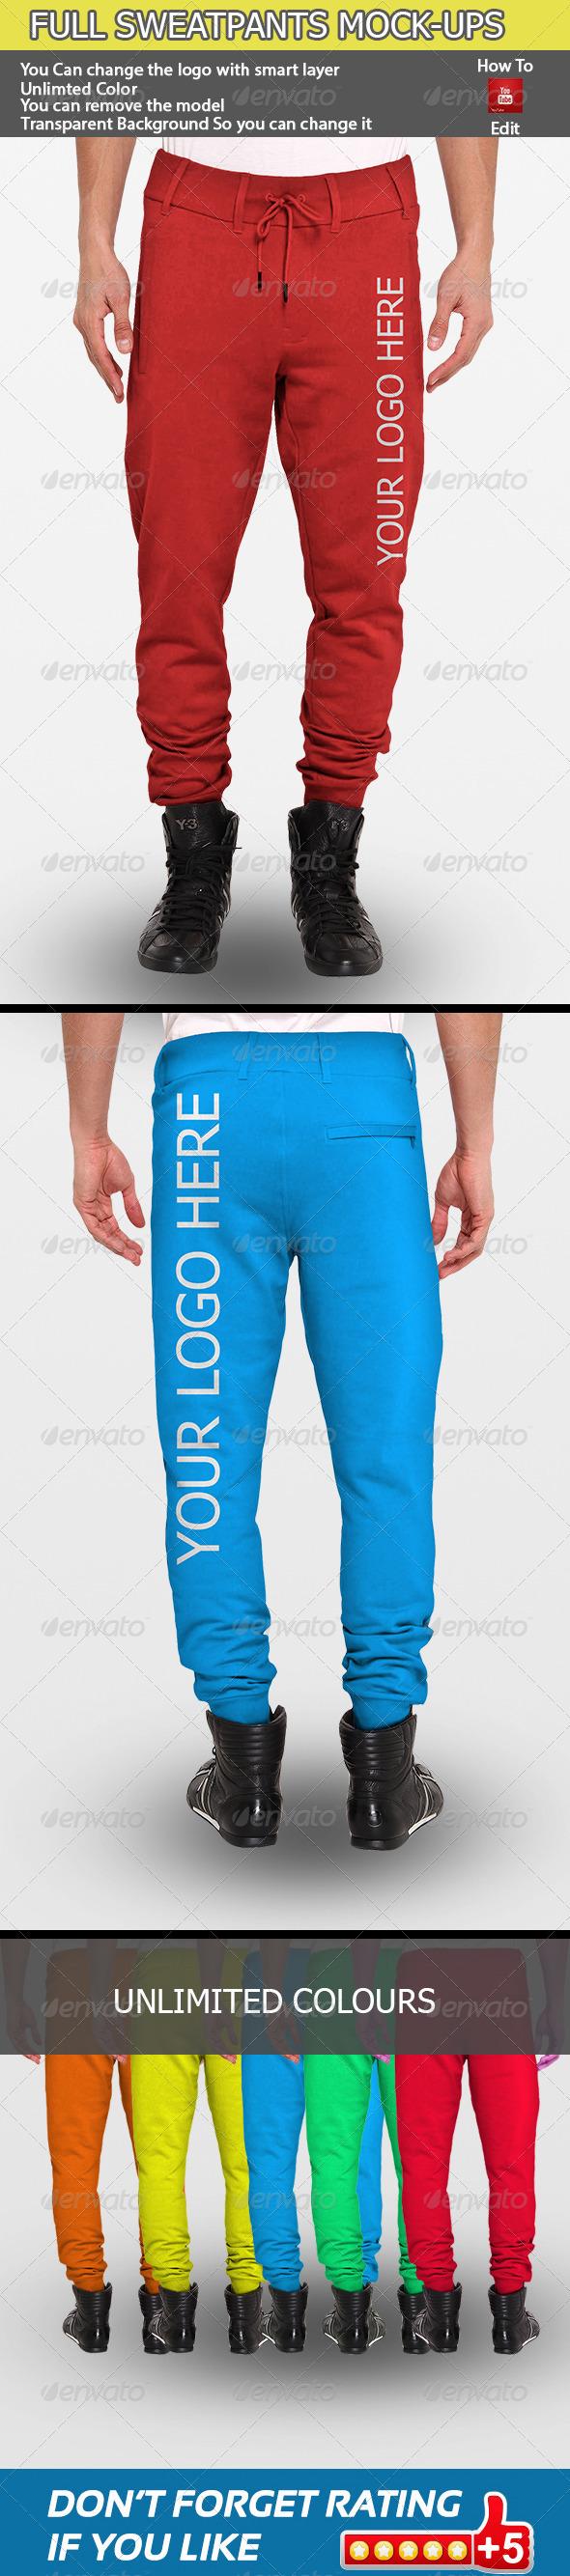 GraphicRiver Full Sweatpants Mock-Ups 7103272